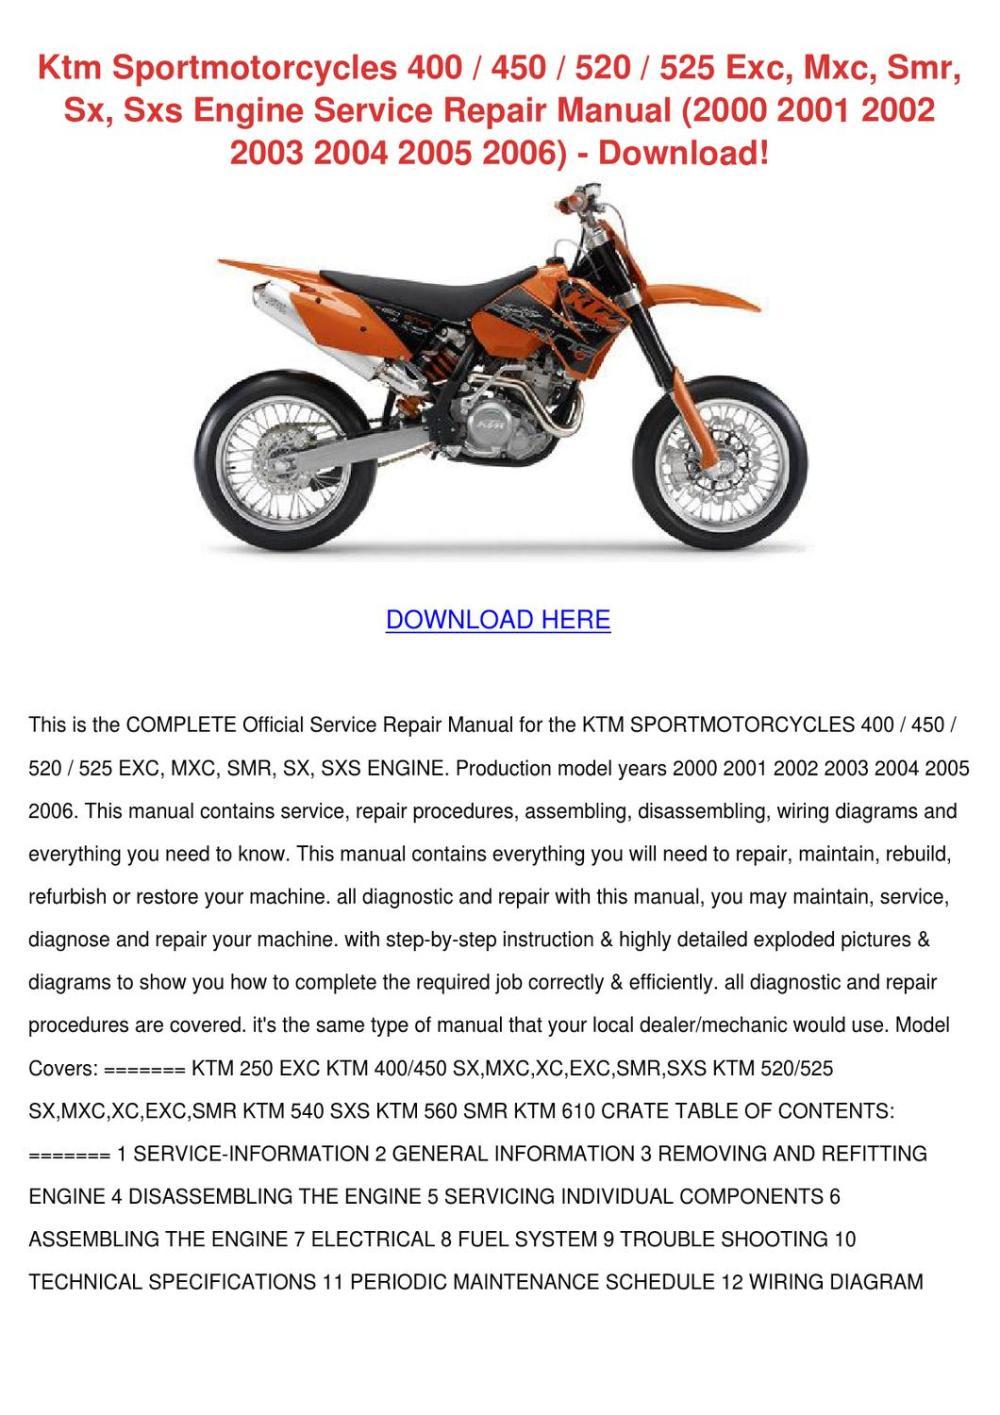 medium resolution of ktm sportmotorcycles 400 450 520 525 exc mxc by 2004 ktm 125 sx 2006 ktm 450 sx